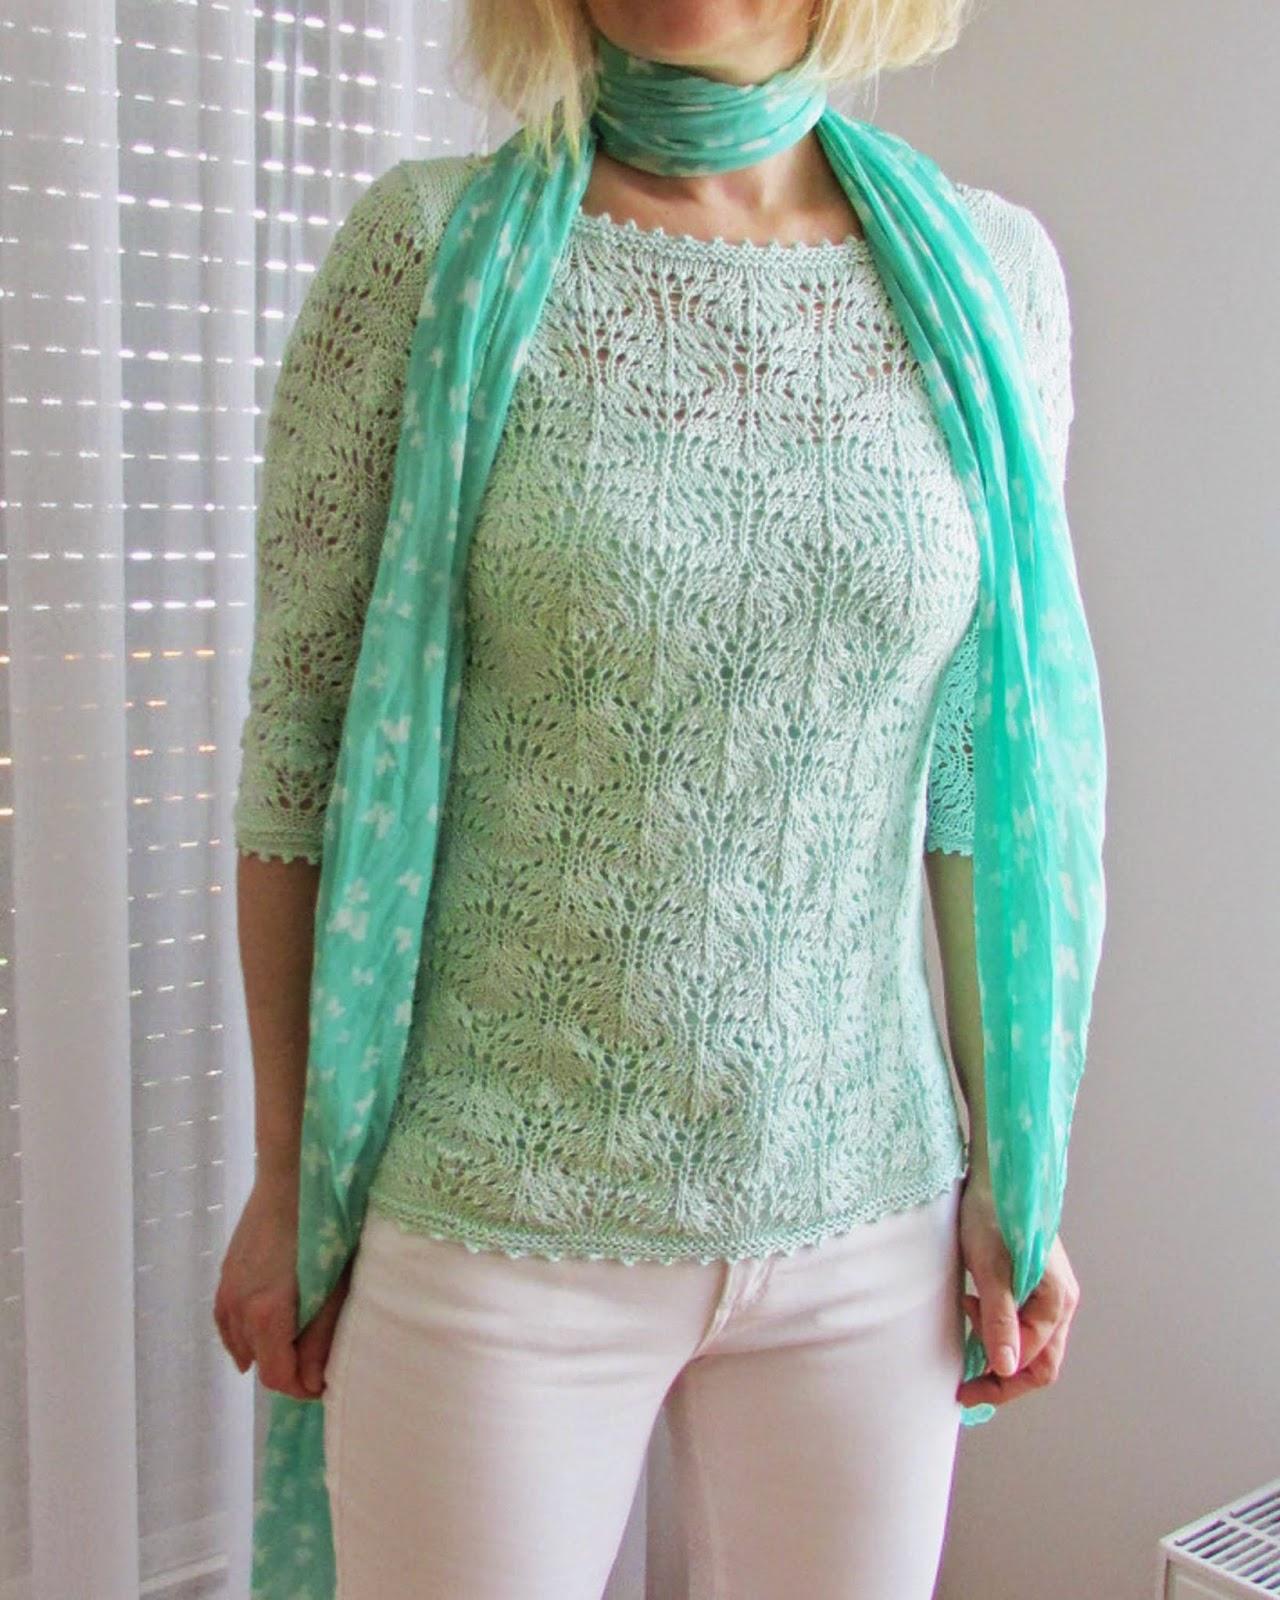 http://ladylinaland.blogspot.com/2014/05/mint-lace-sweater.html